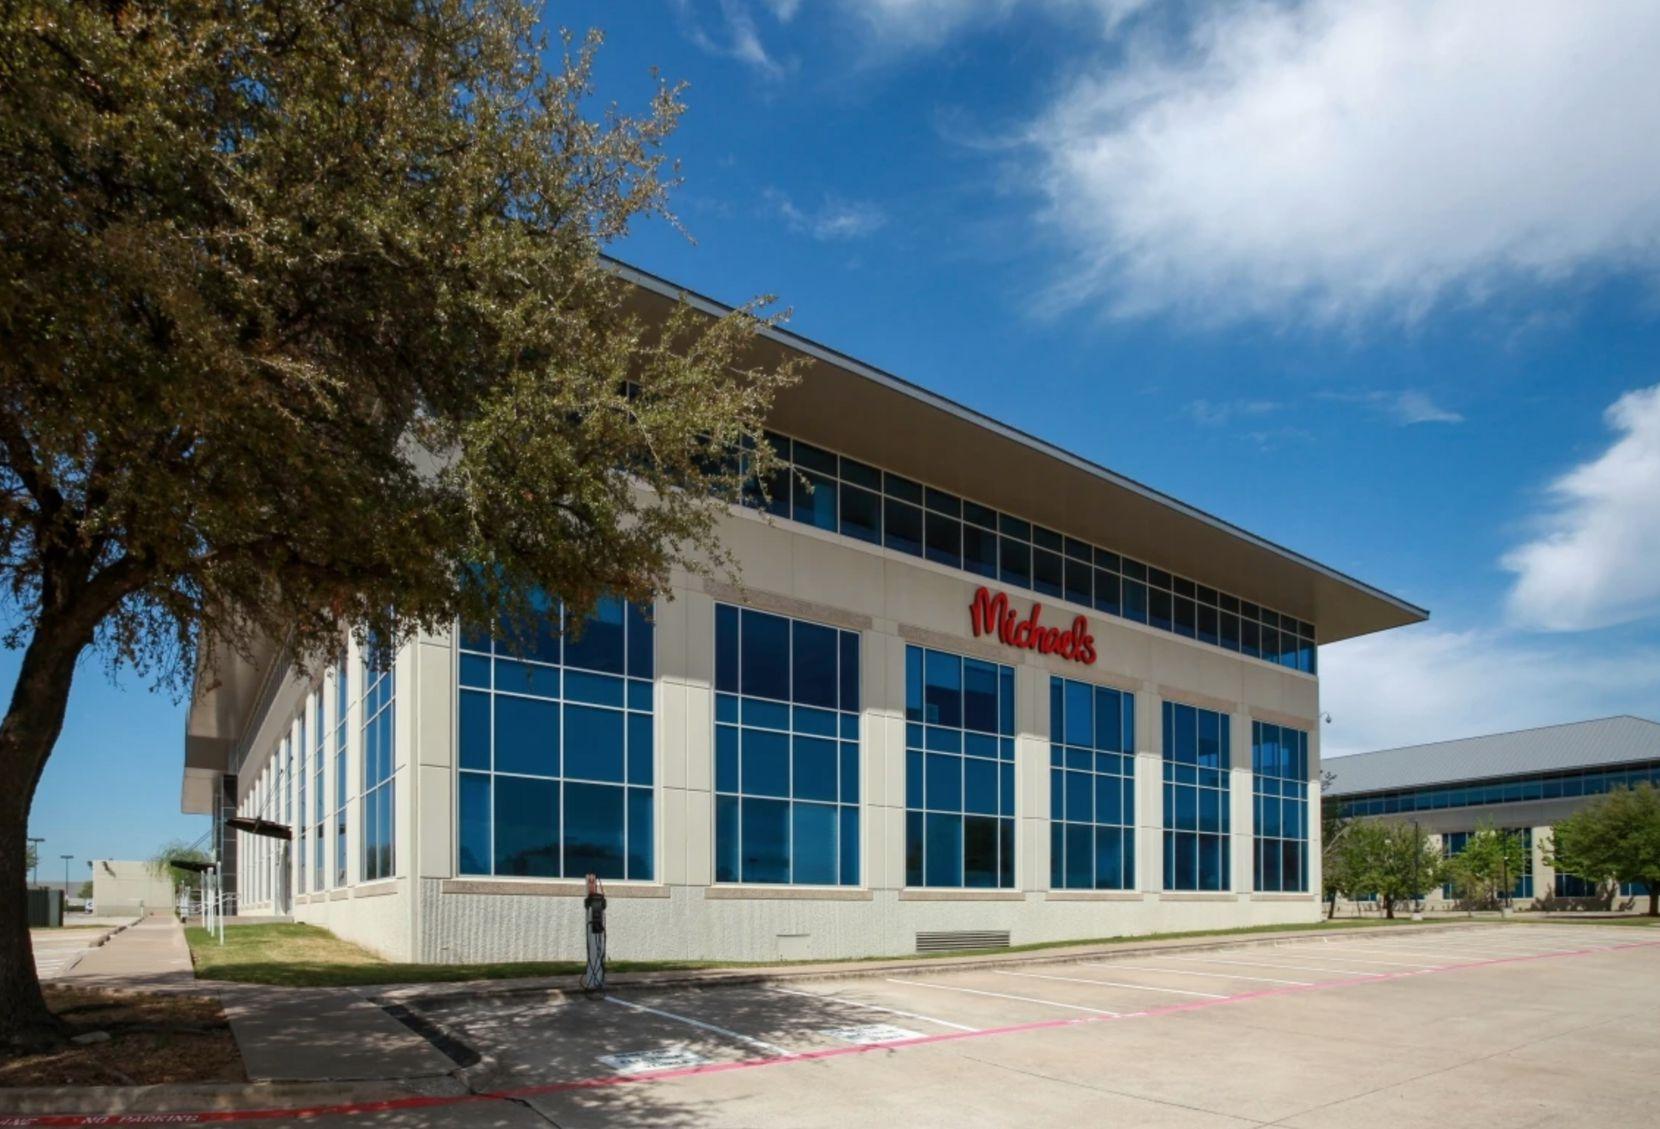 Retailer Michael's has its headquarters in the campus.